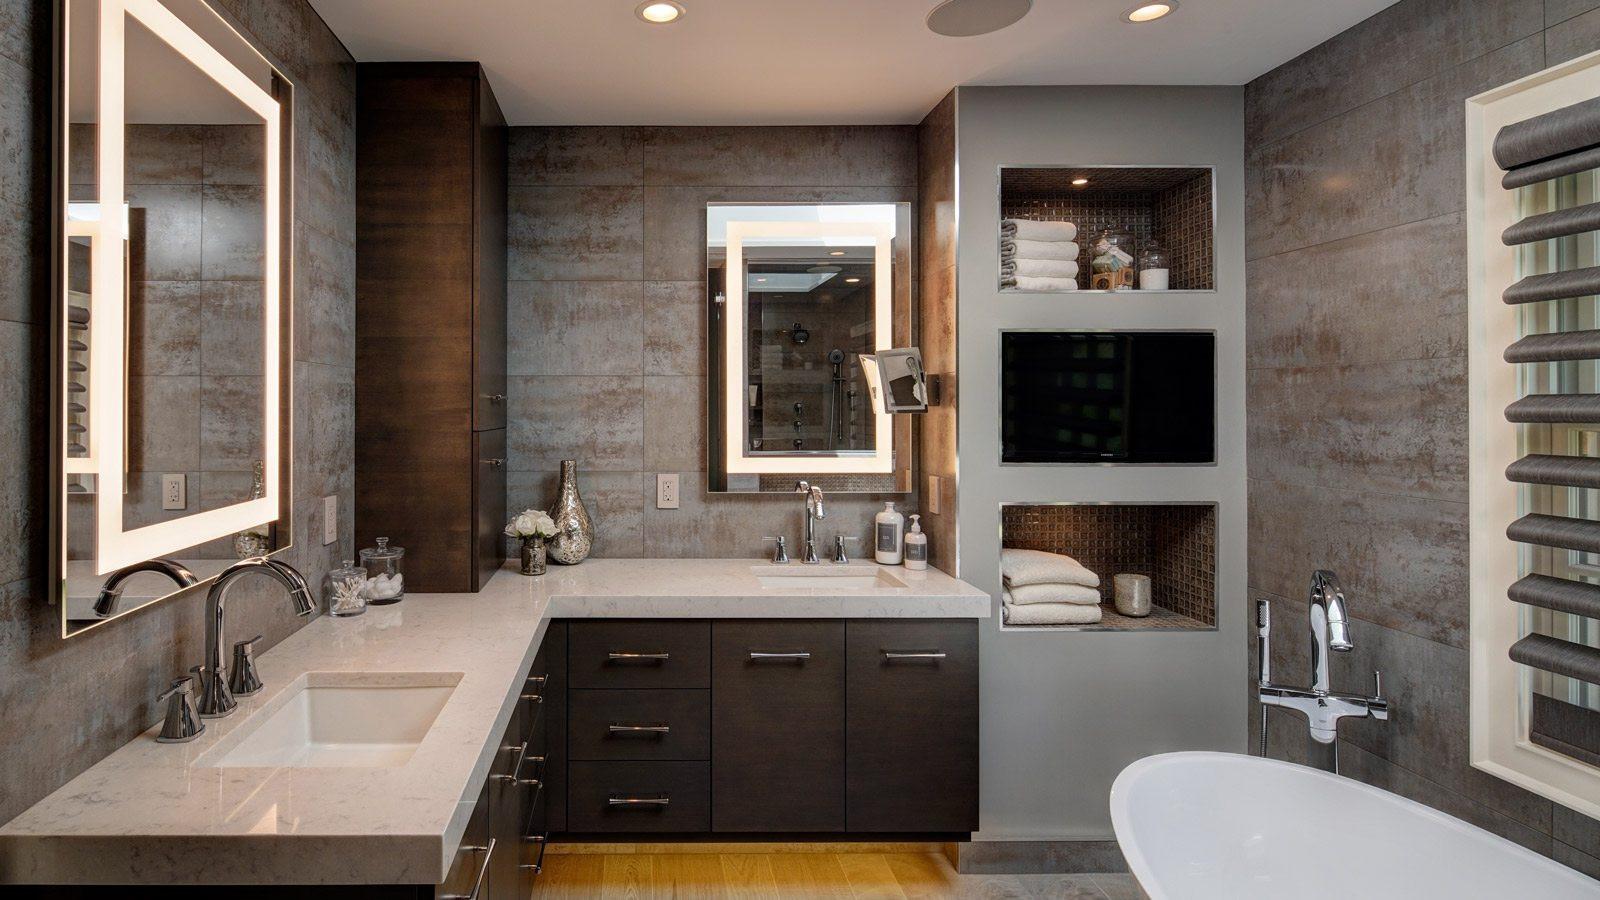 Spa Master Bathroom  Dreamy Spa Inspired Master Bath Remodel Drury Design